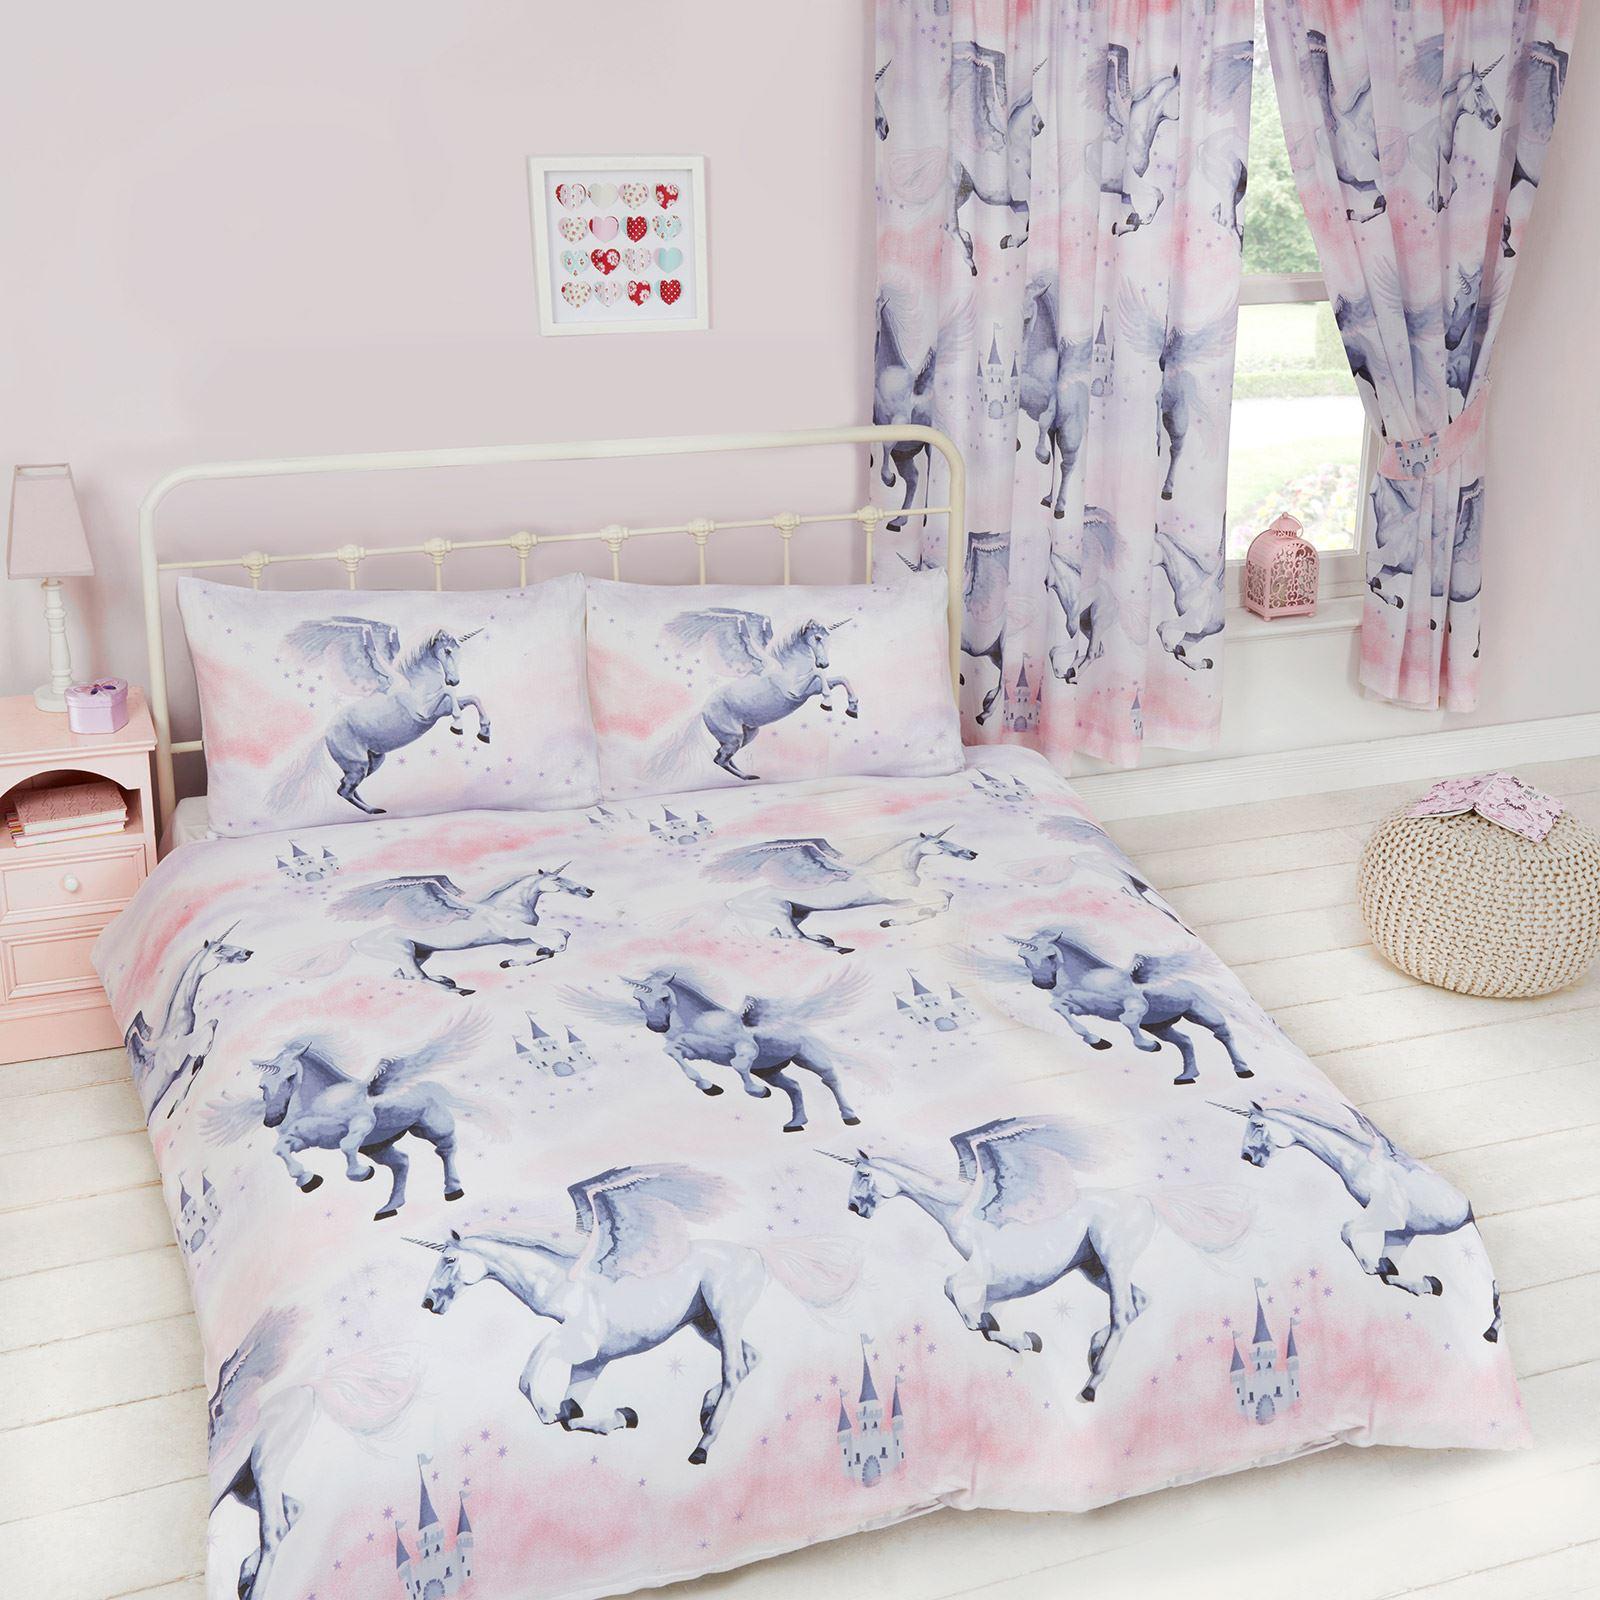 Stardust Unicorn Double Duvet Cover Set New Bedding